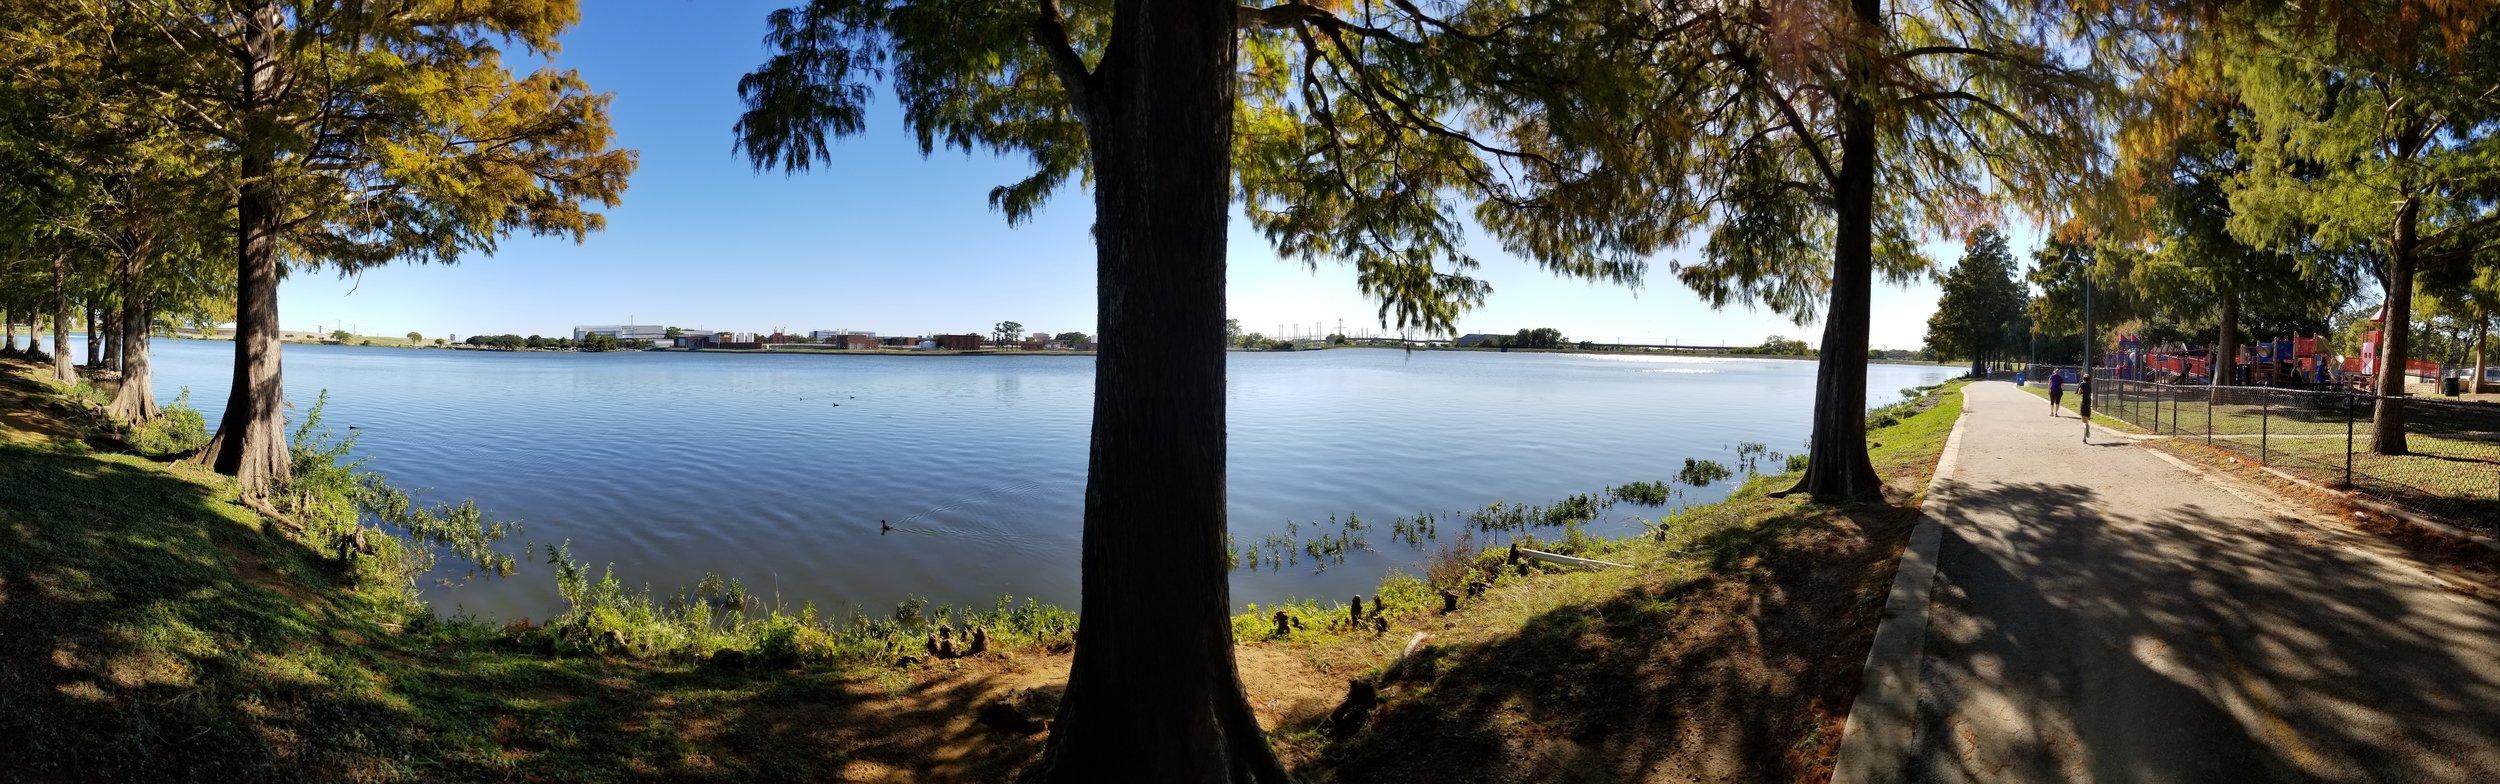 Beautiful Bachman Lake Location for a Skatepark